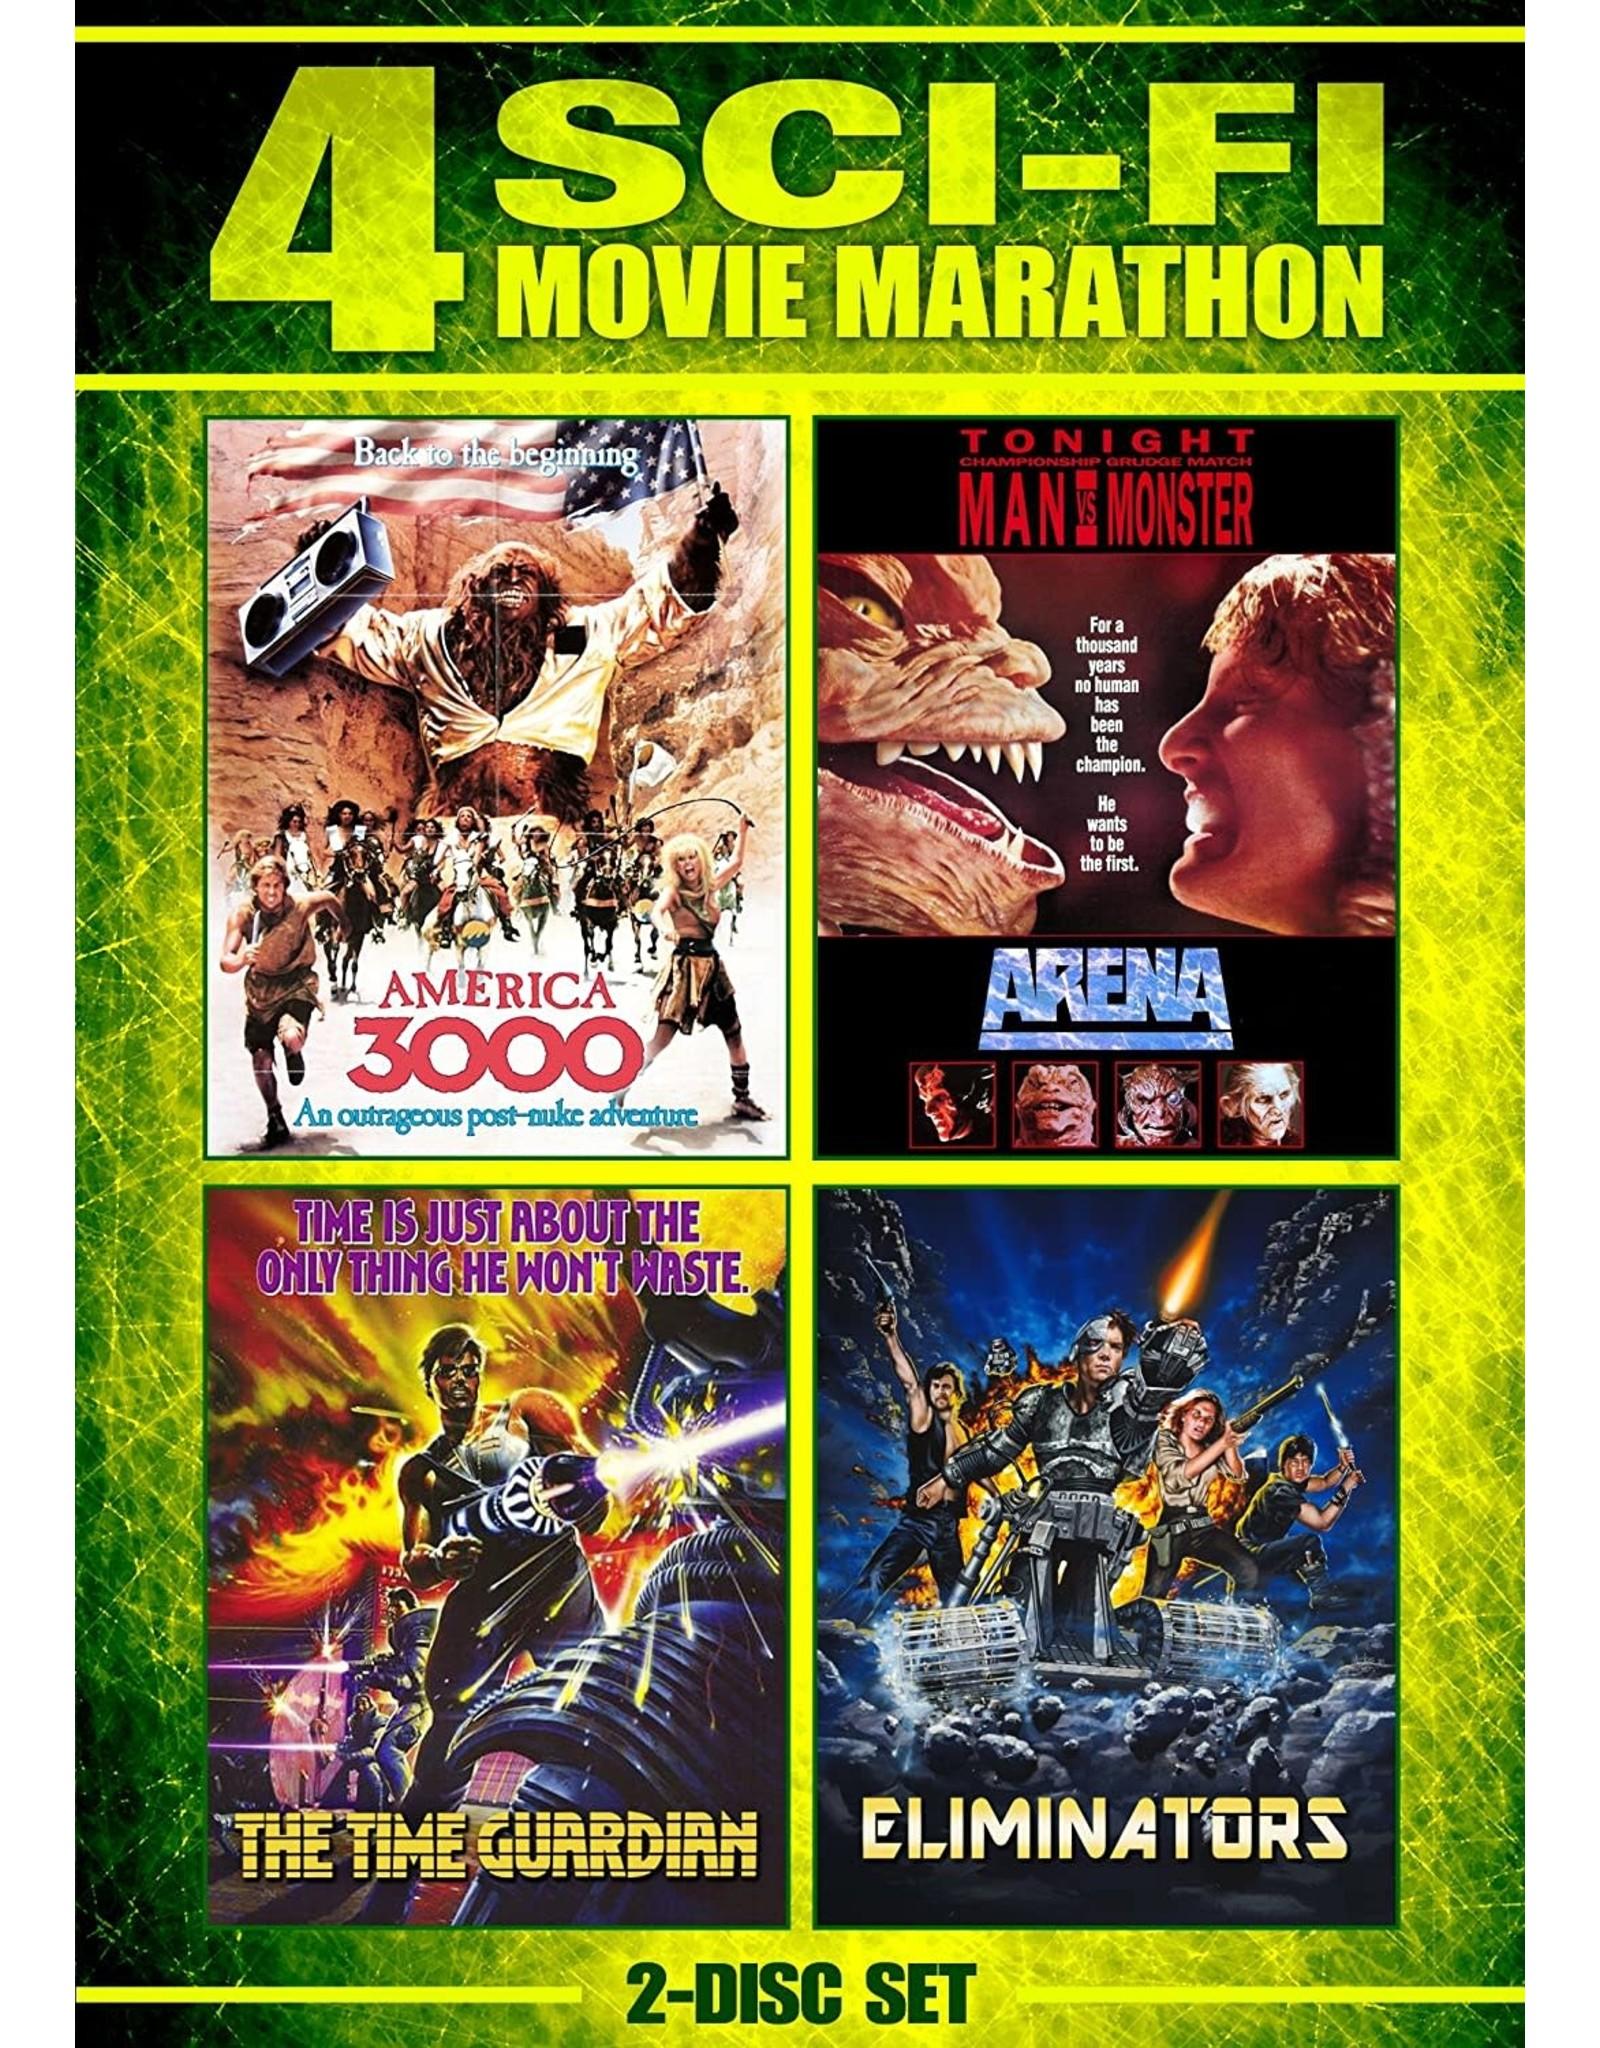 Cult and Cool Arena / Eliminators / America 3000 / The Time Guardian Sci-Fi 4 Movie Marathon